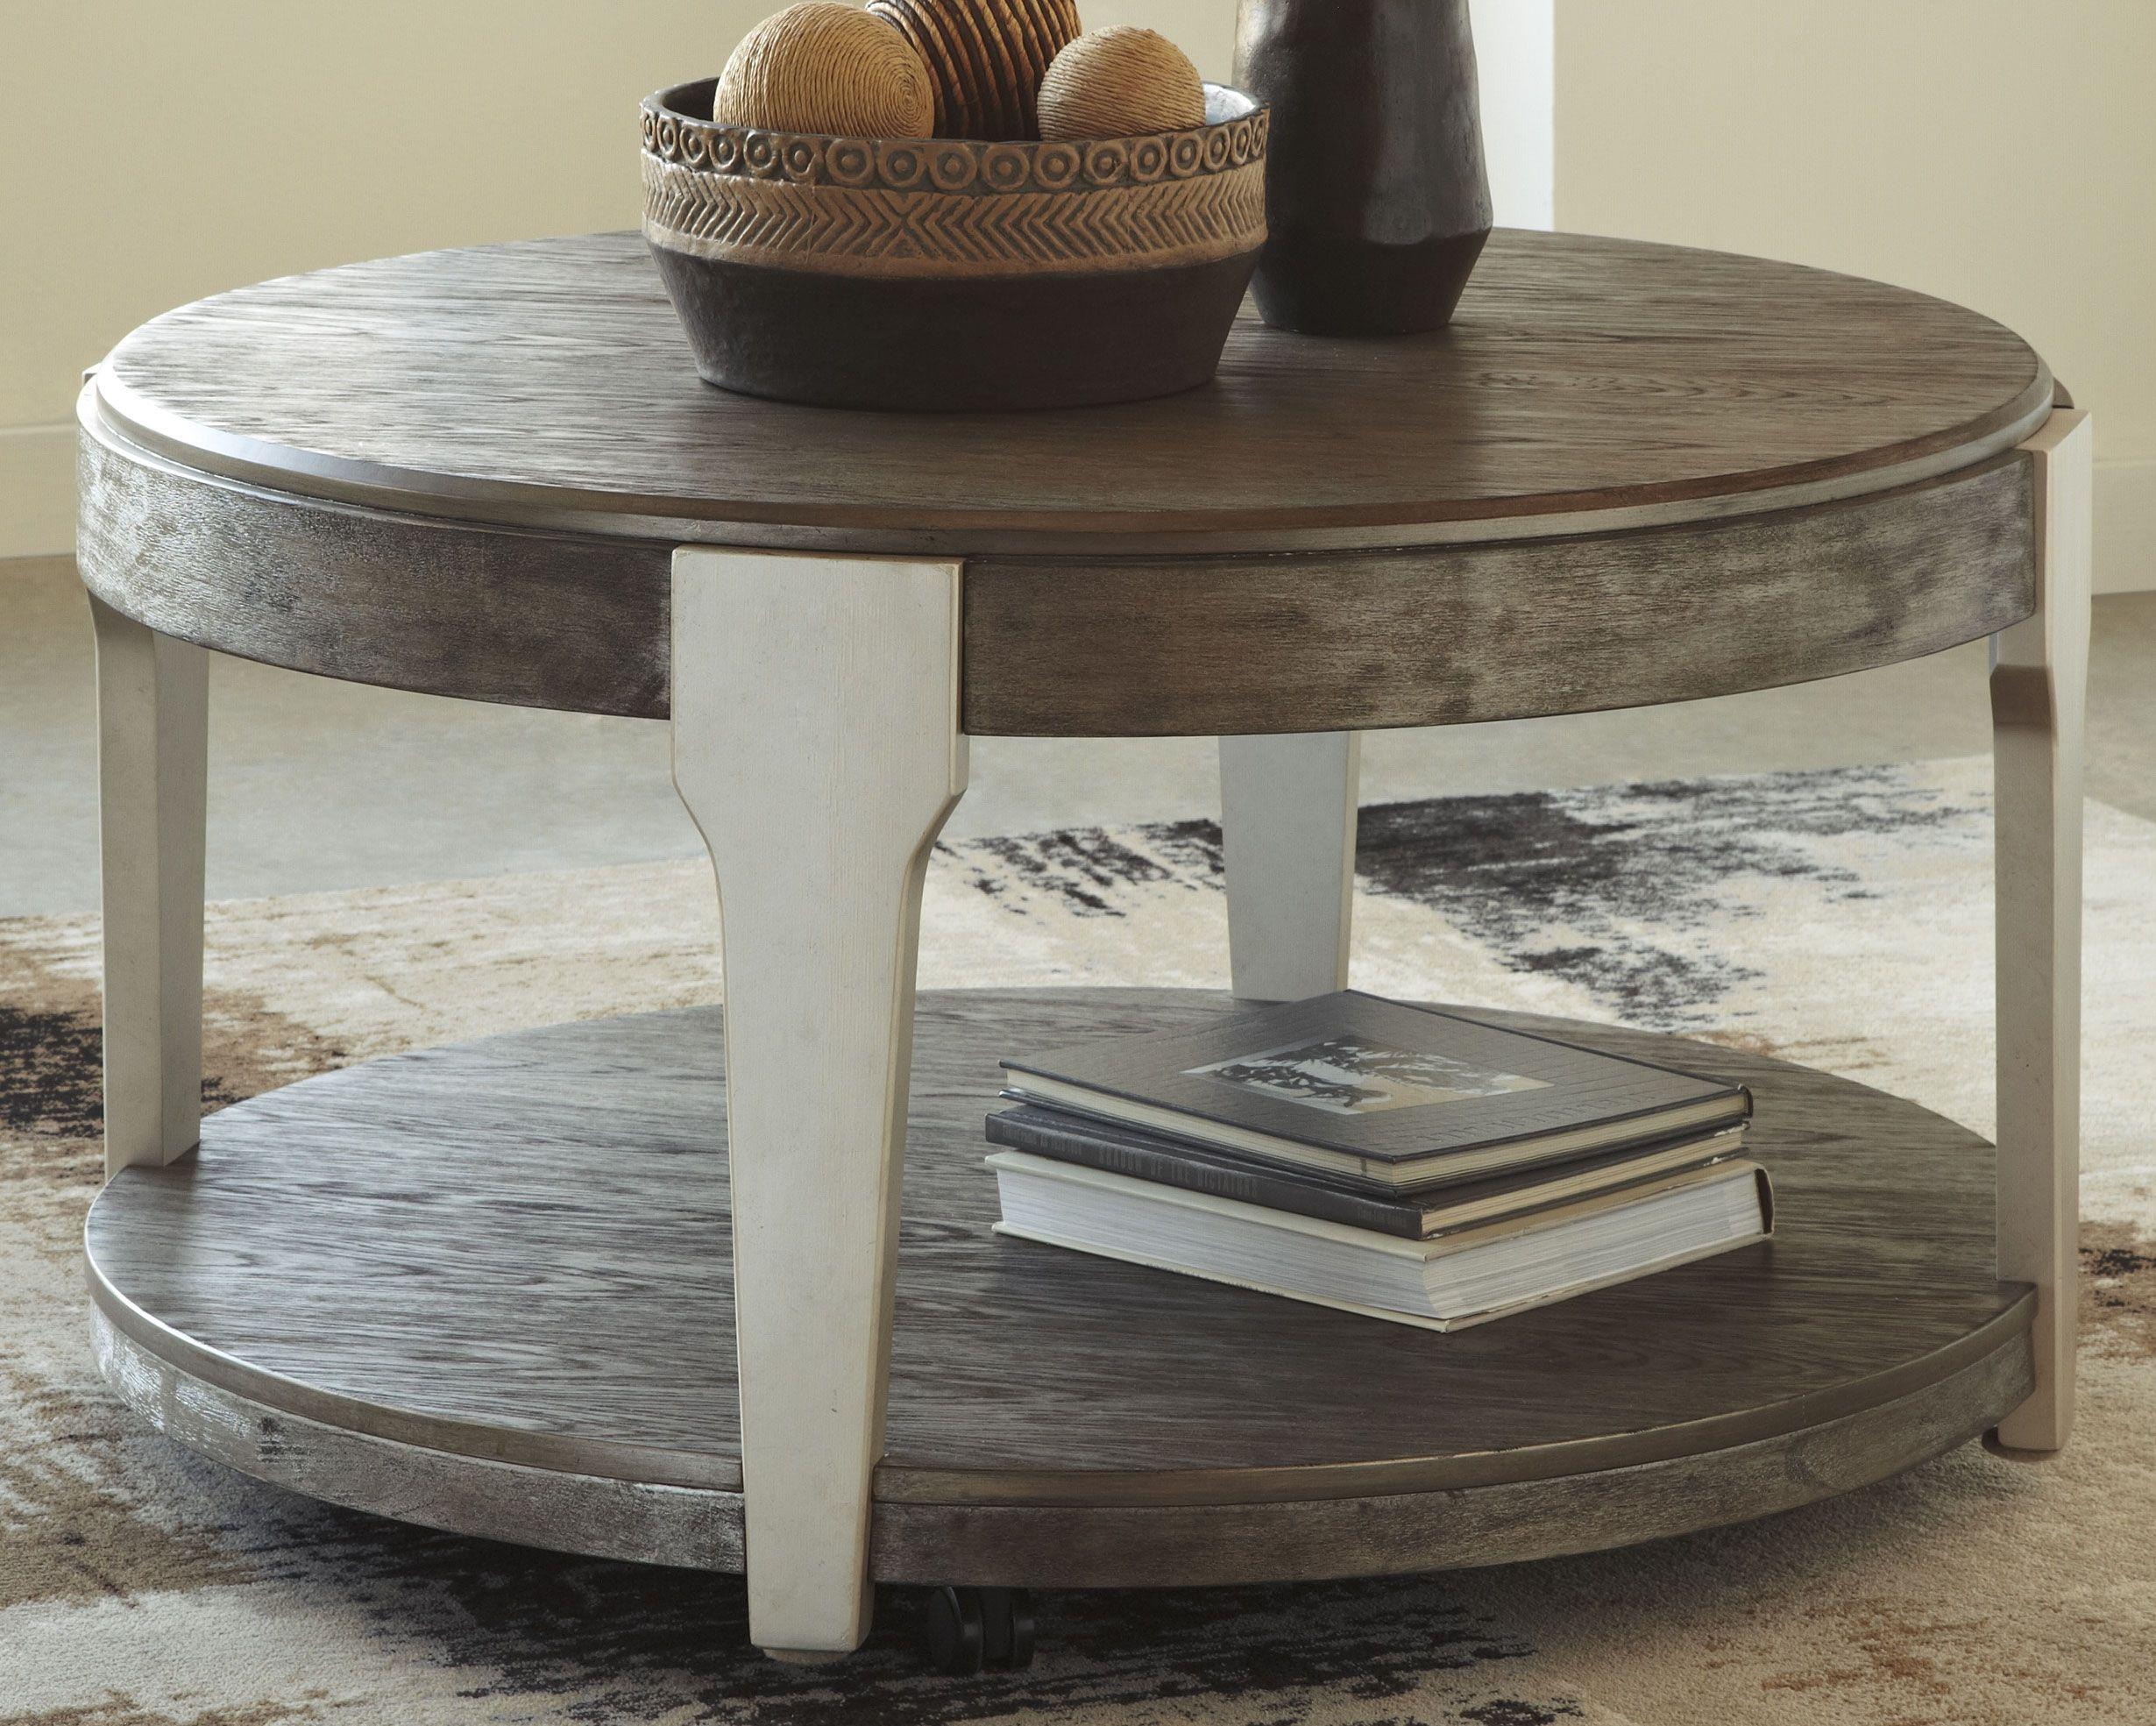 Brenzington Coffee Table Grayish Brown Silver Round Wood Coffee Table Round Coffee Table Coffee Table Wood [ 1969 x 2460 Pixel ]